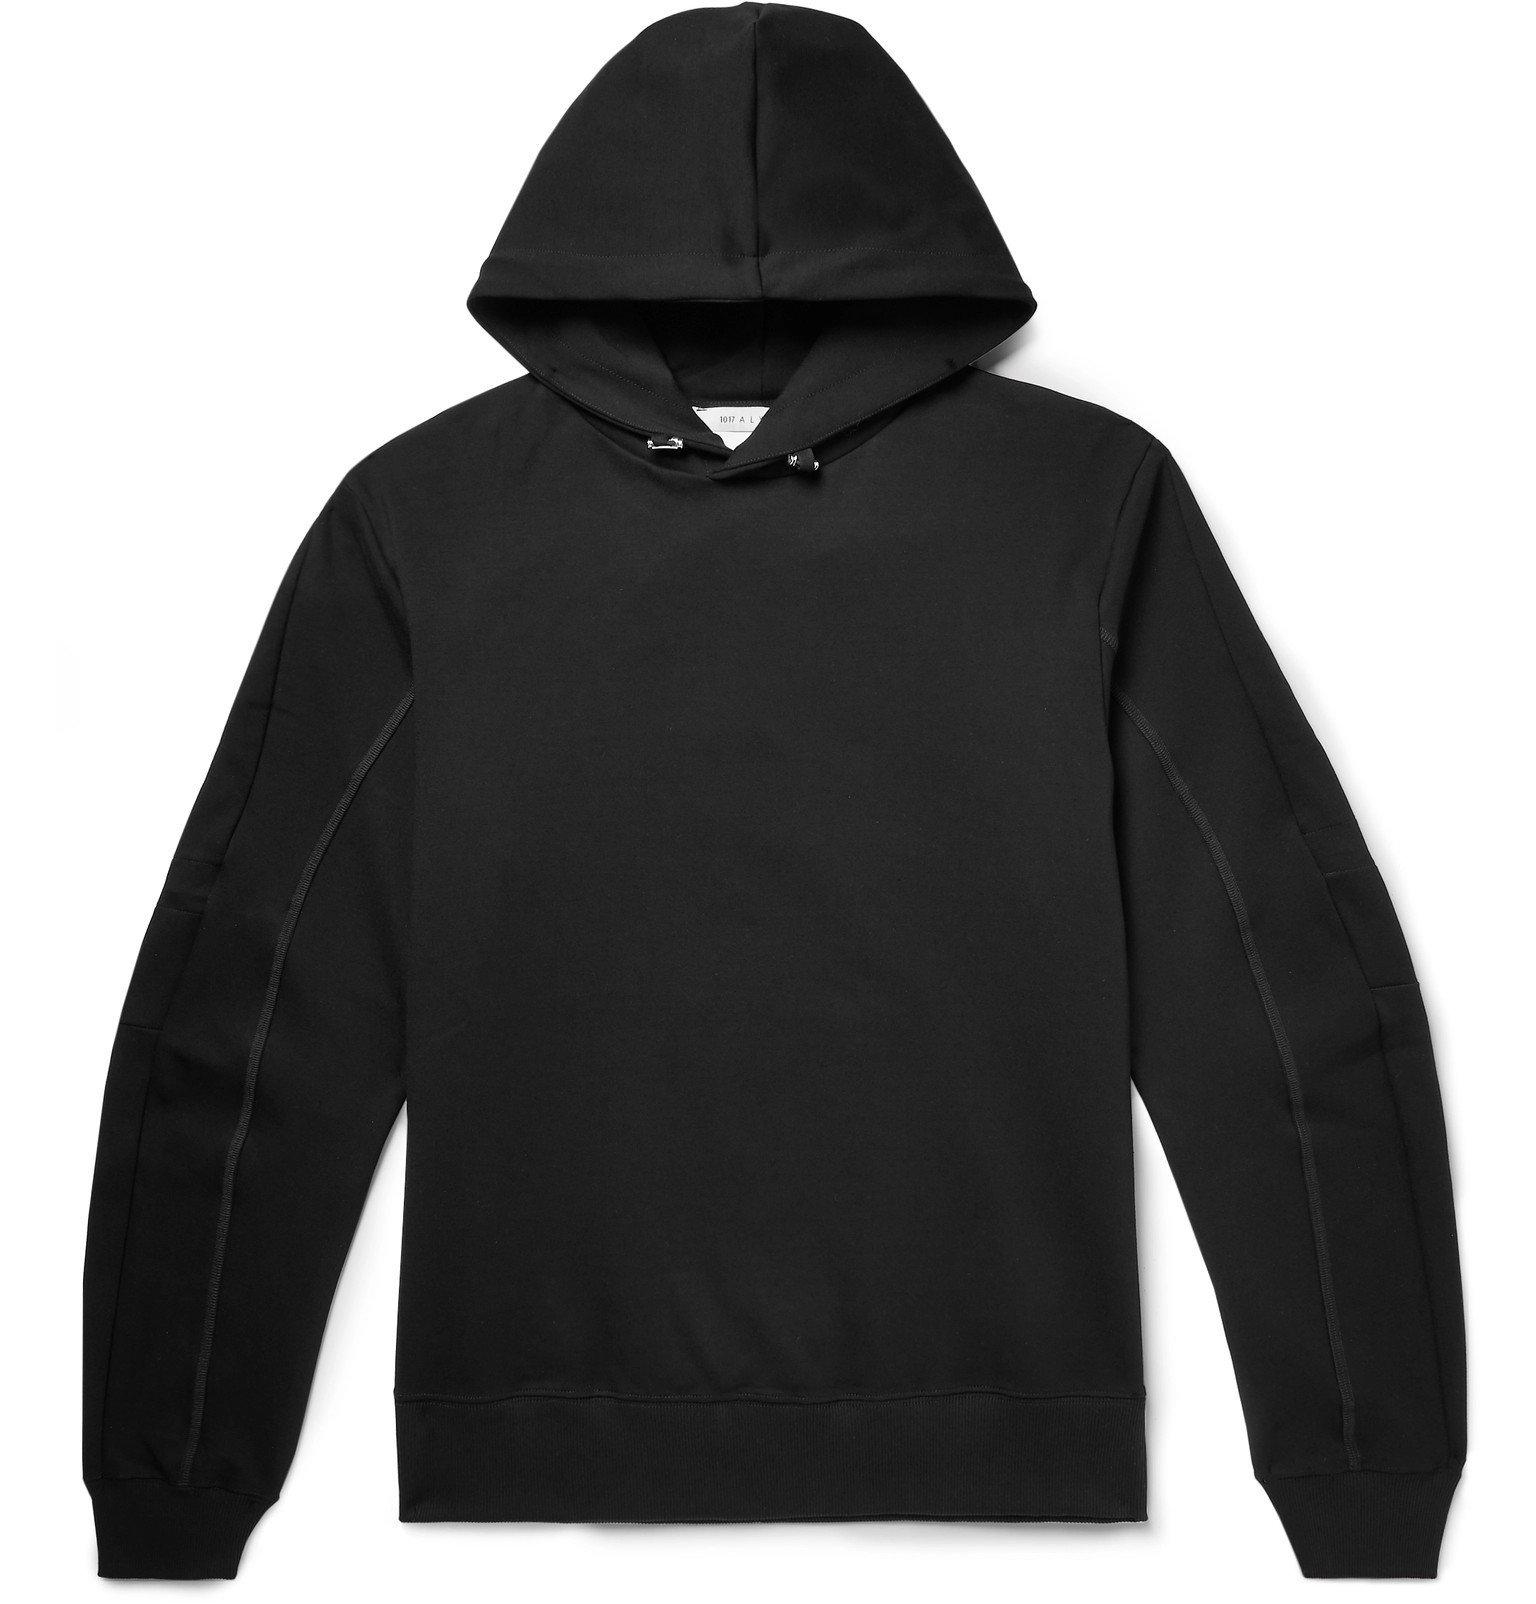 1017 ALYX 9SM - Stretch-Jersey Hoodie - Black